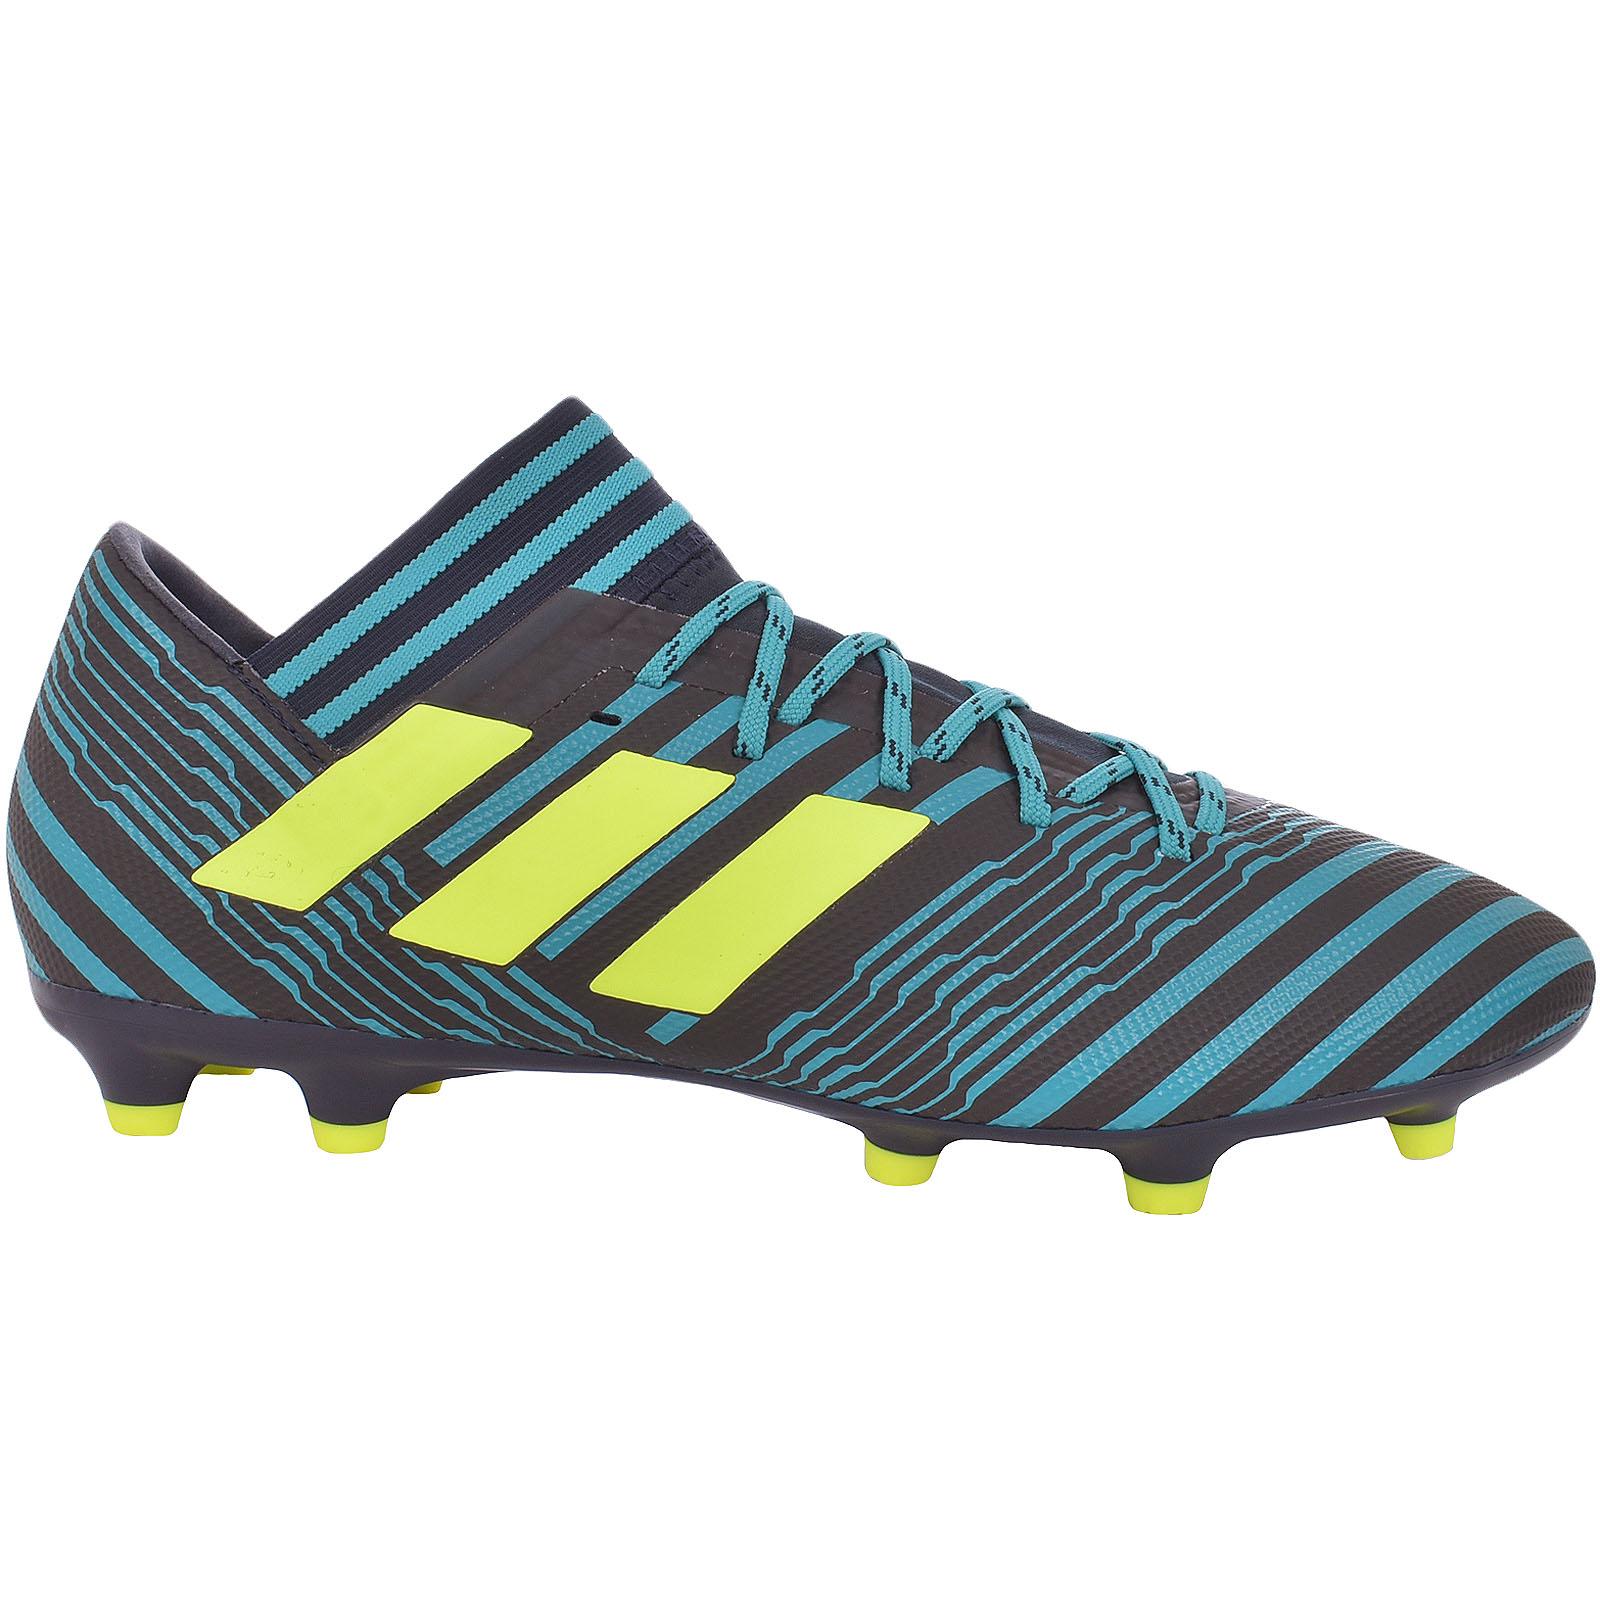 7371ff788bbf adidas Mens Nemeziz 17.3 FG Football BOOTS Shoes Footwear Sports ...